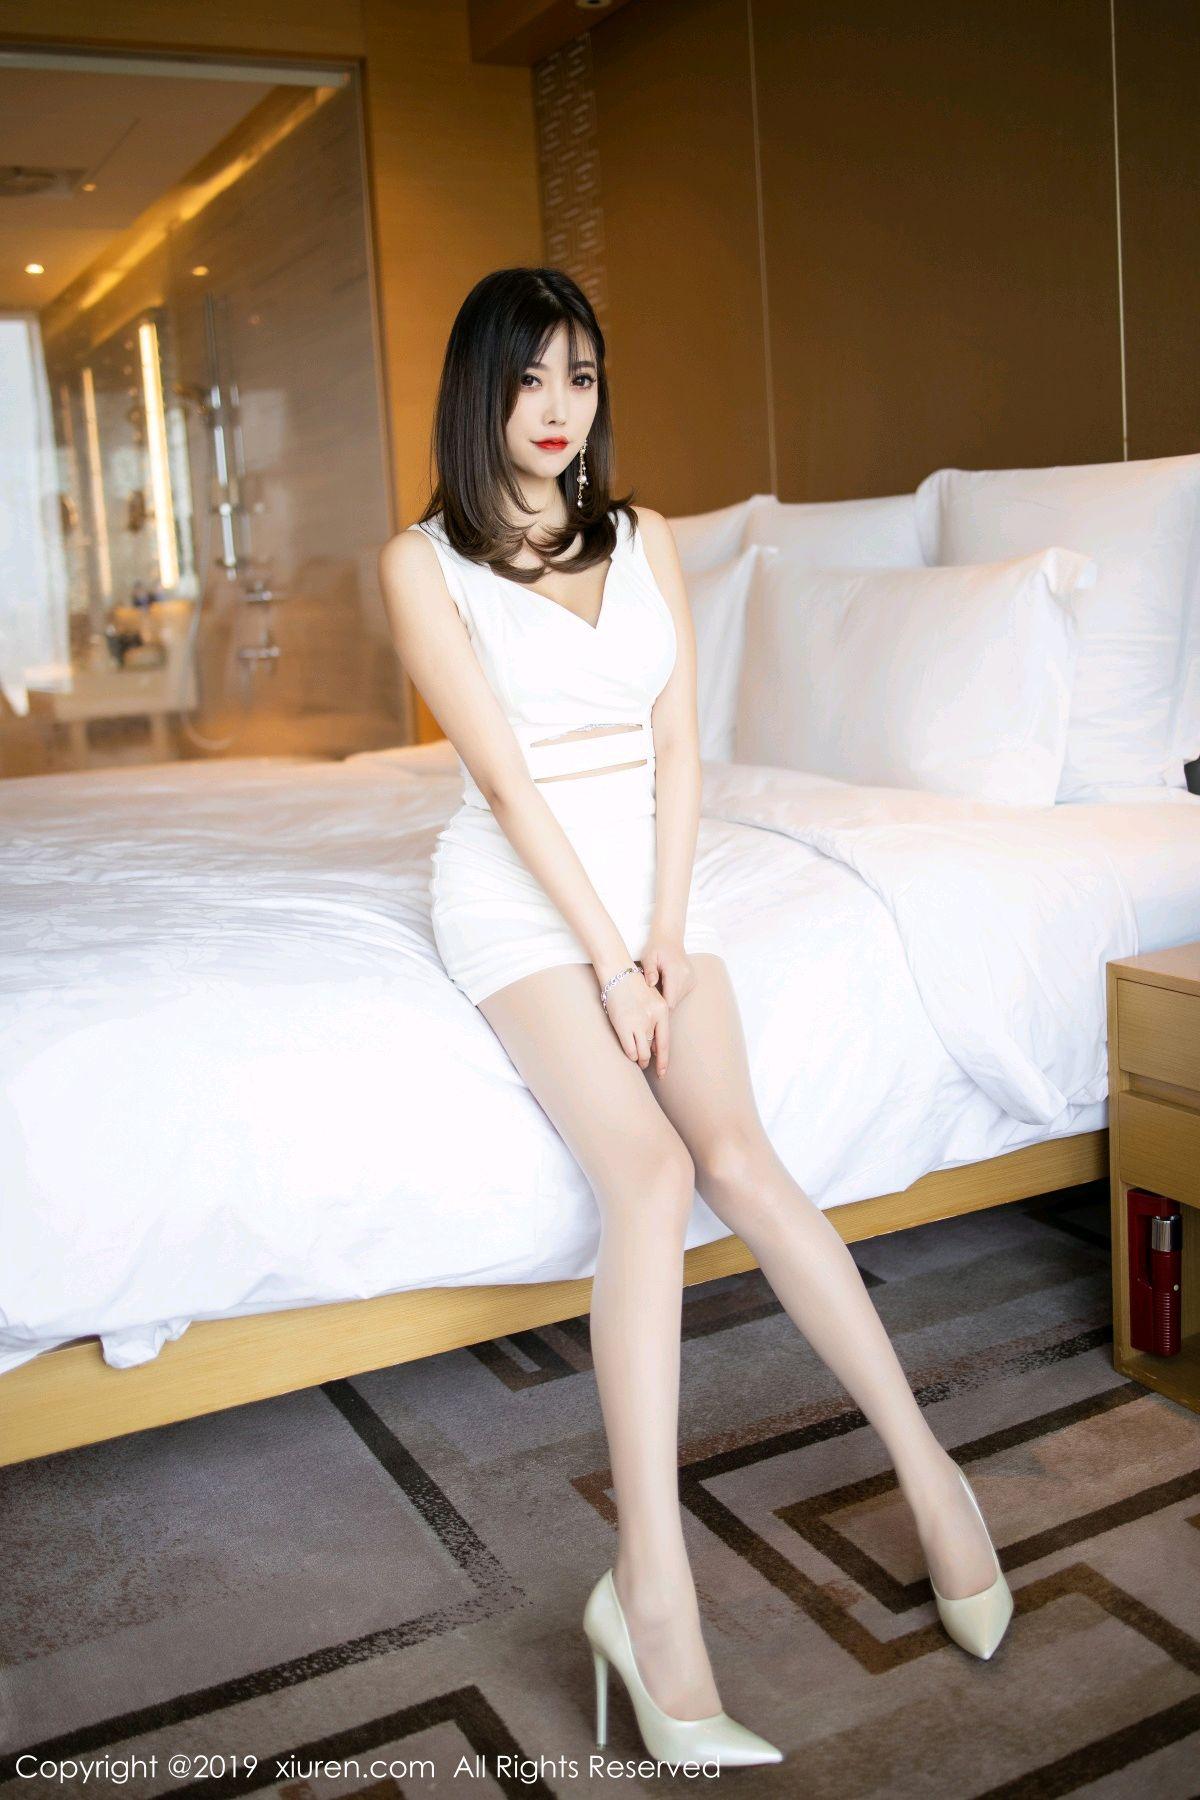 [XiuRen] Vol.1695 Yang Chen Chen 30P, Foot, Tall, Underwear, Xiuren, Yang Chen Chen